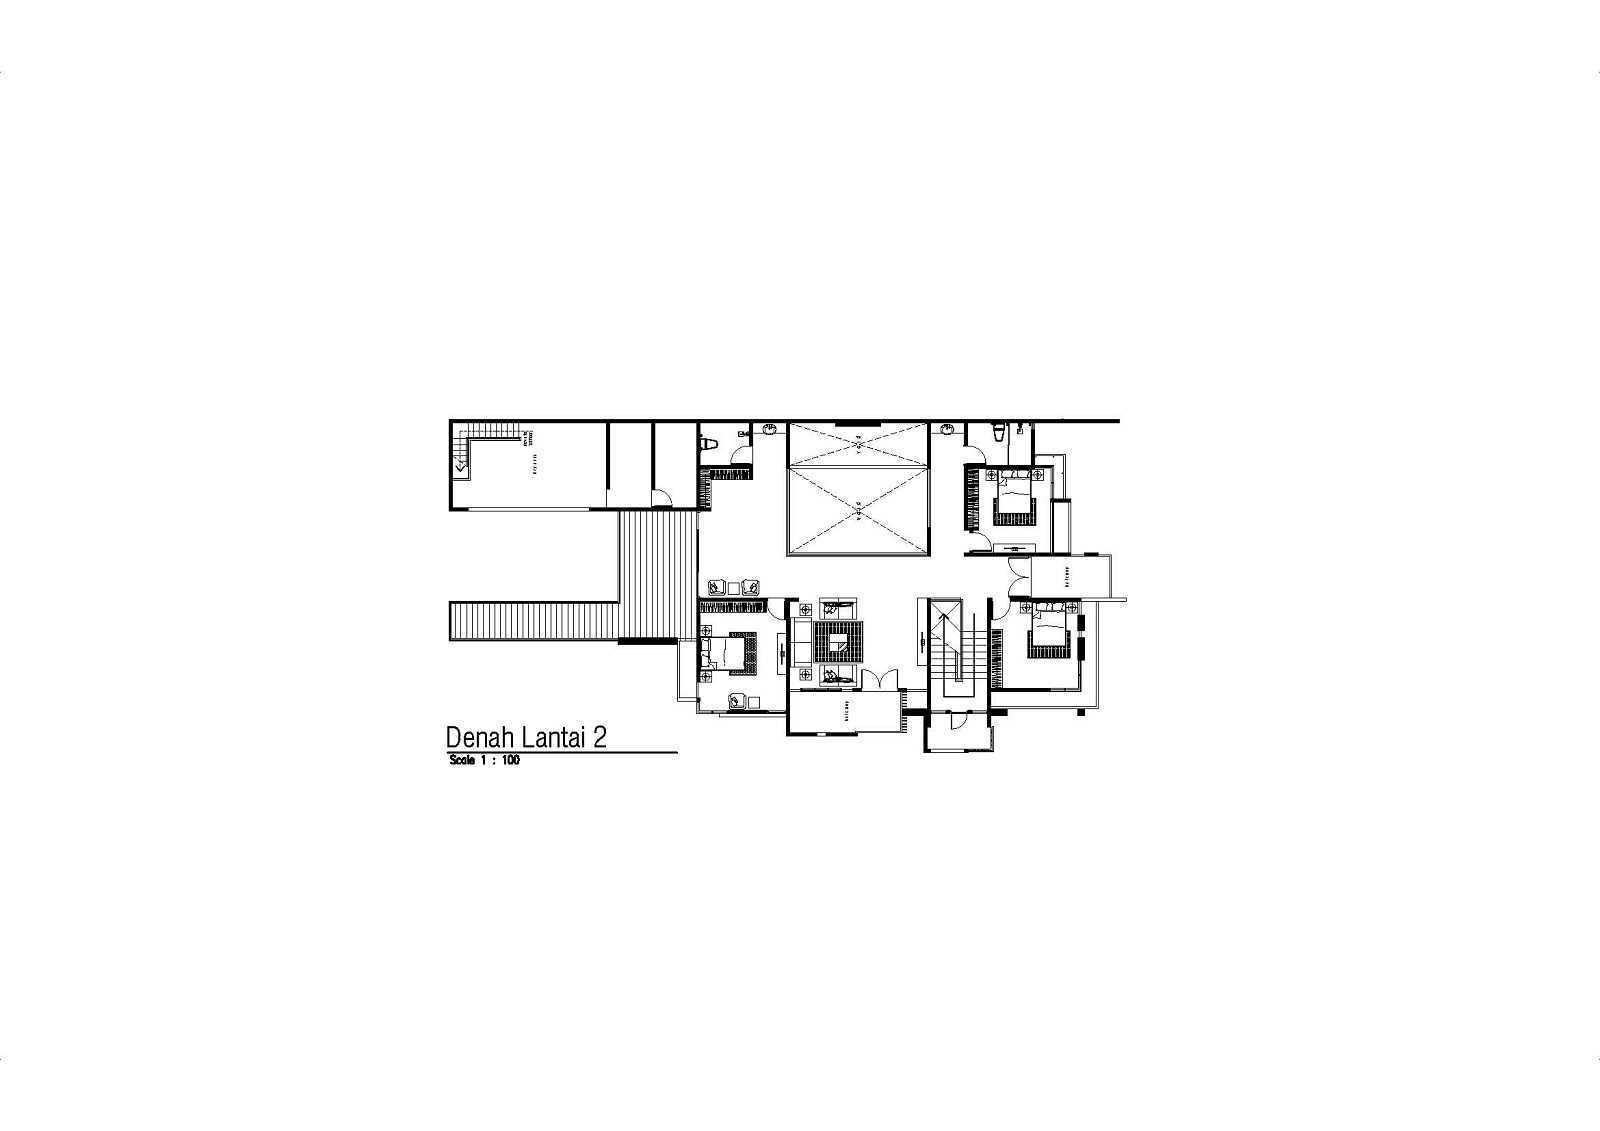 Satuvista Architect Rumah Tropis Hook Kabupaten Jombang, Jawa Timur, Indonesia Jawa Timur, Indonesia Floorplan 2Nd Floor   48708